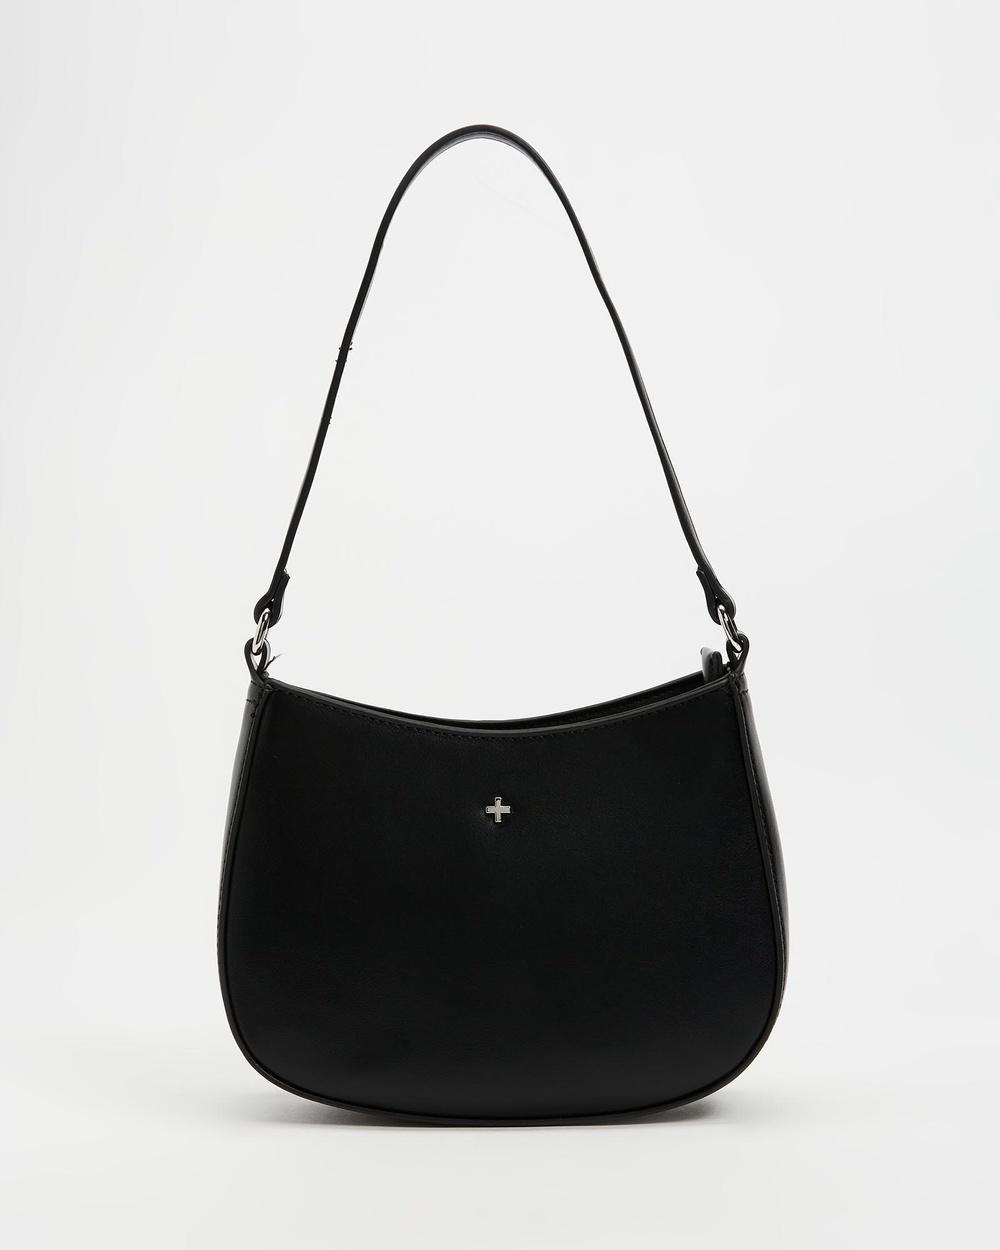 PETA AND JAIN Priya Handbags Black Smooth & Silver